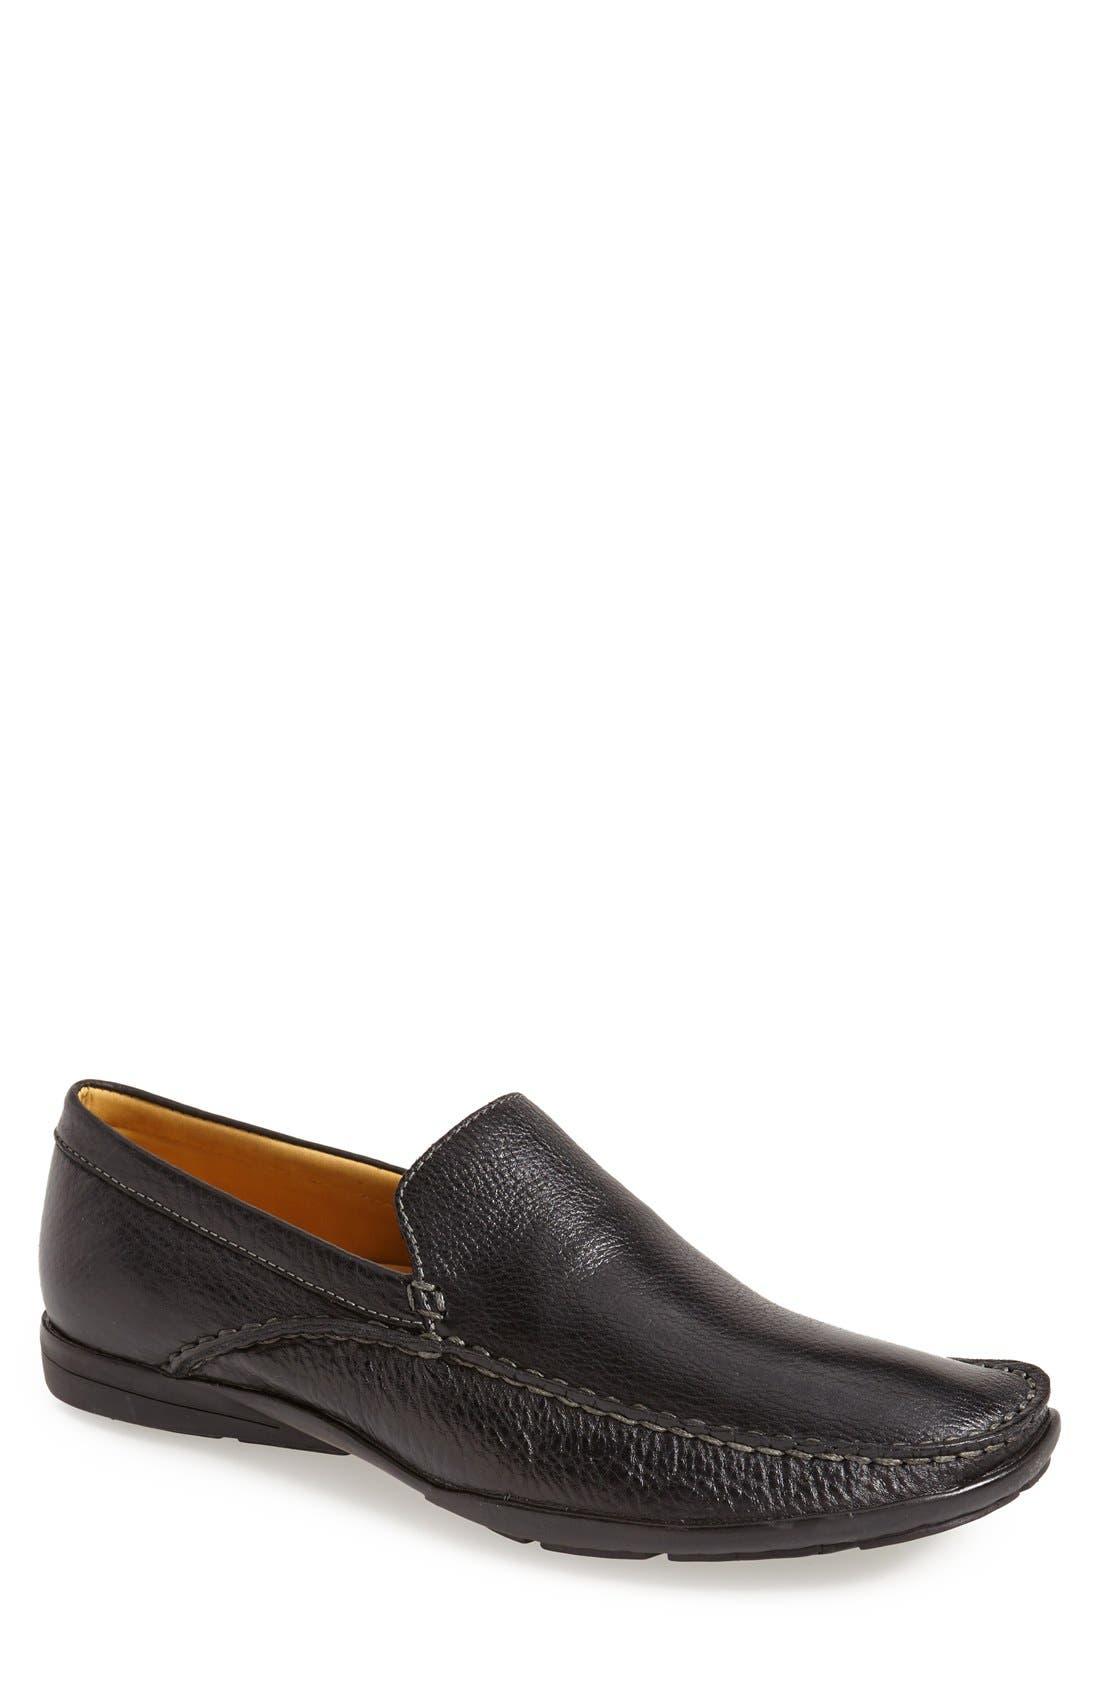 'Dillon' Loafer,                         Main,                         color, BLACK